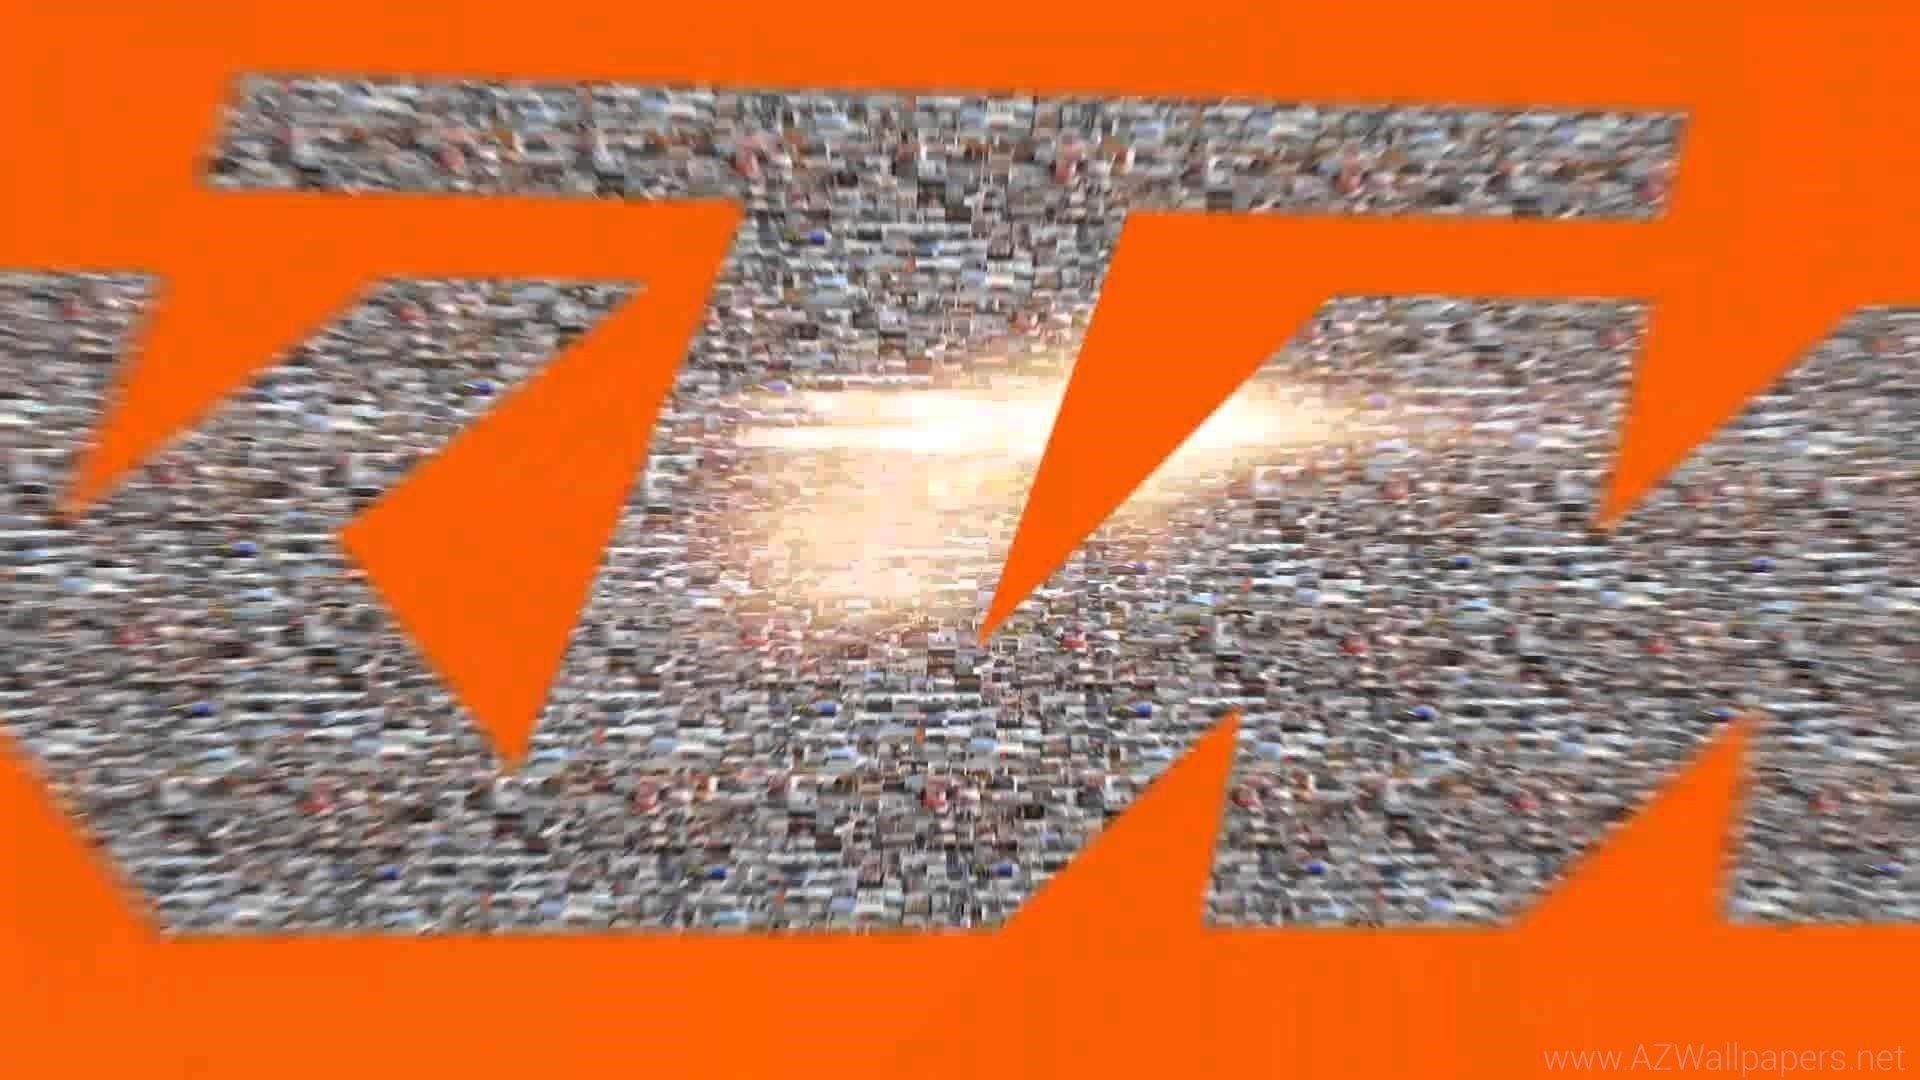 Ktm Ready To Race Logo Vector >> Ktm Logo Wallpaper HD (70+ images)